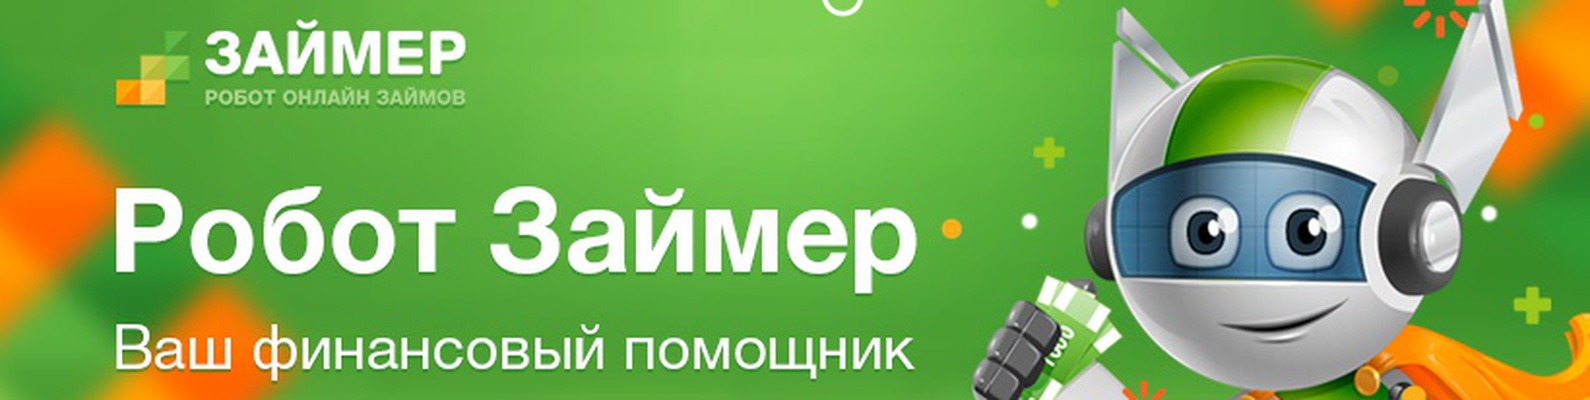 Lime (Лайм) Займ - официальный сайт ‒ сервис быстрых